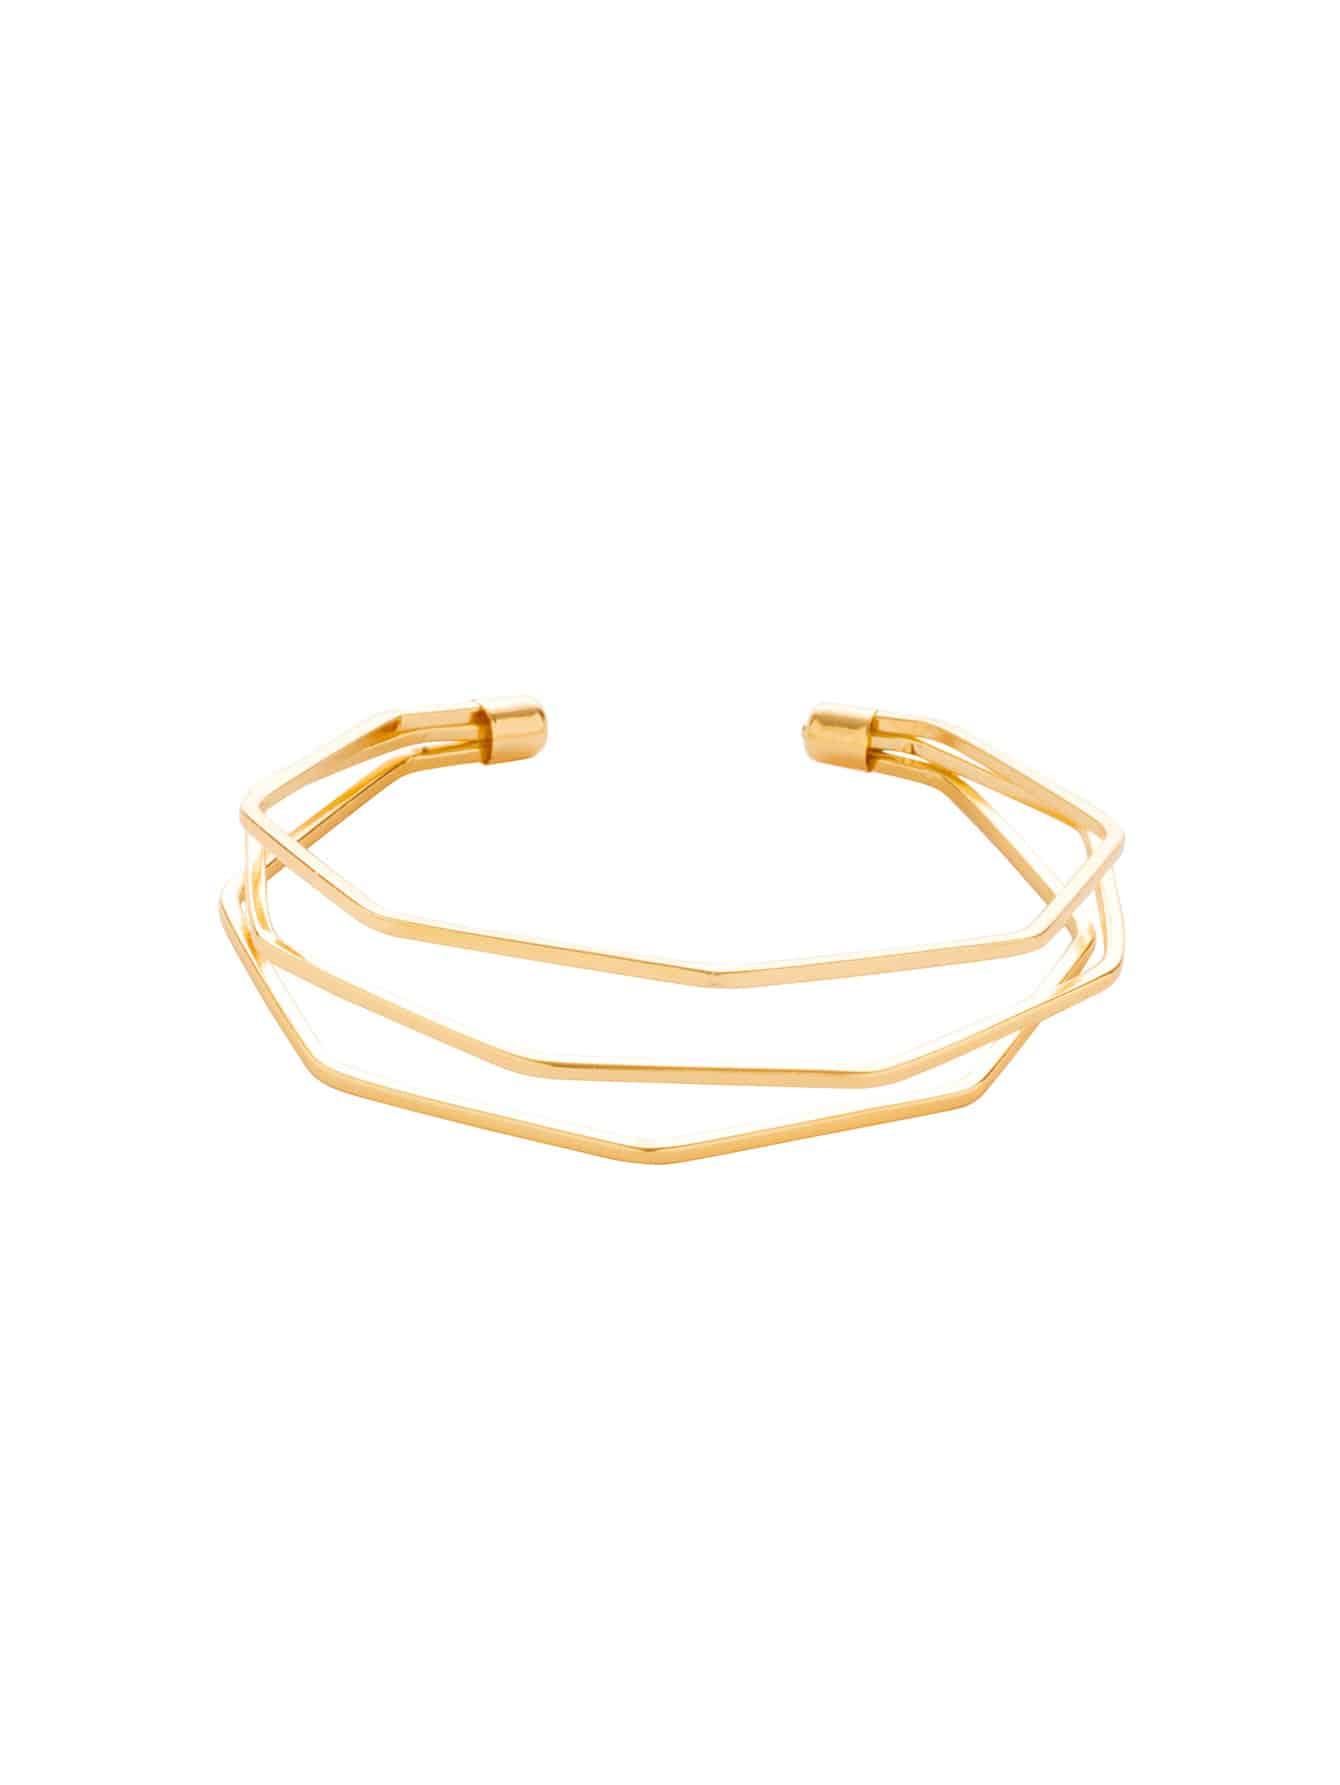 Layered Cuff Bracelet faux pearl detail layered cuff bracelet